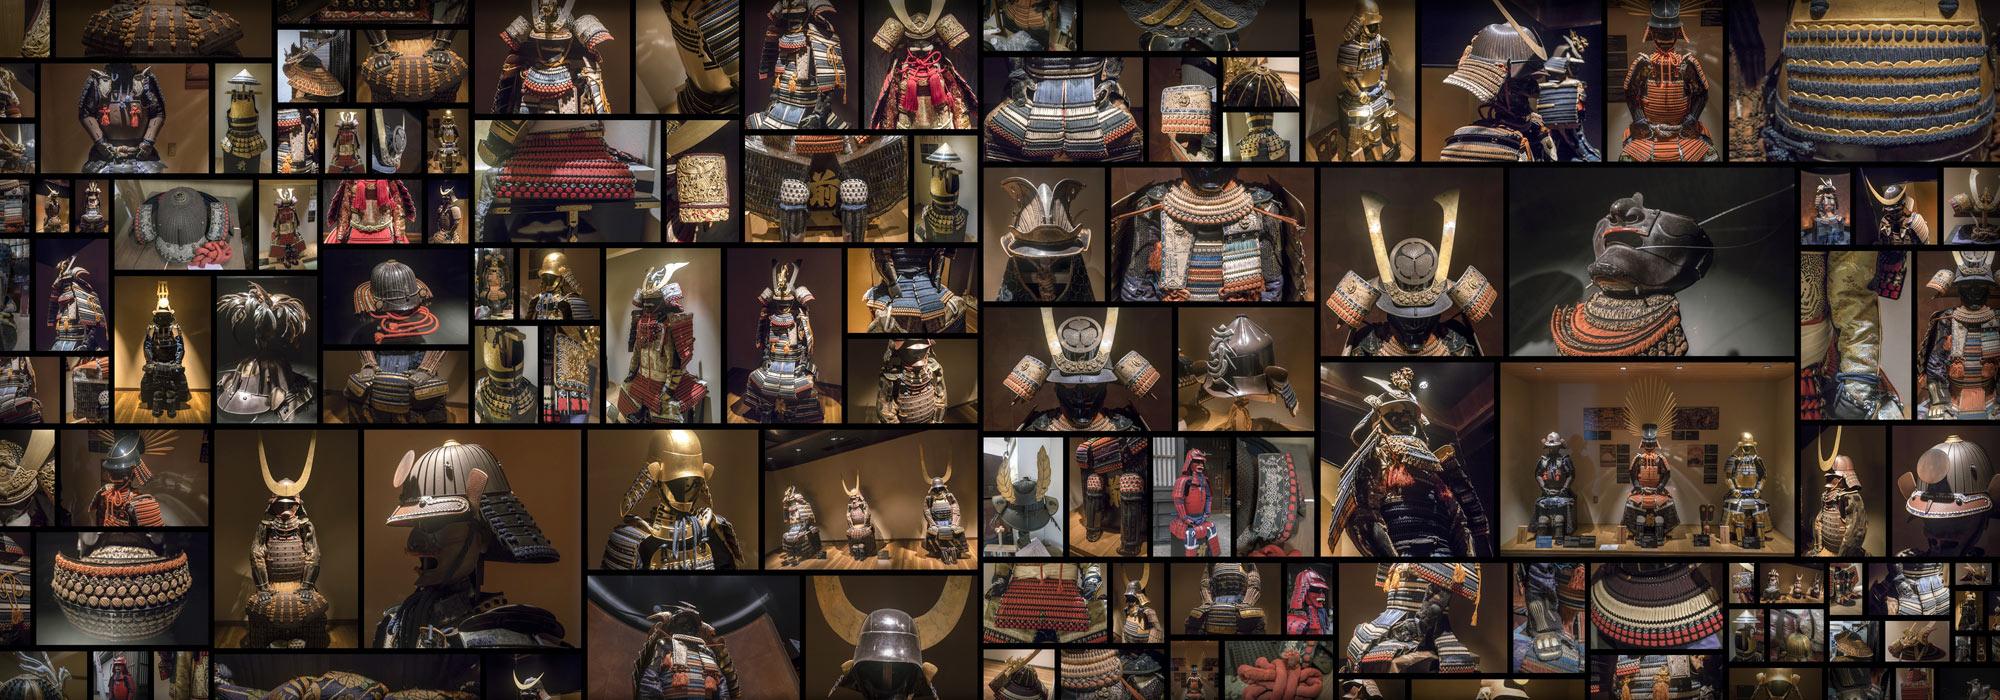 Samurai Armor References